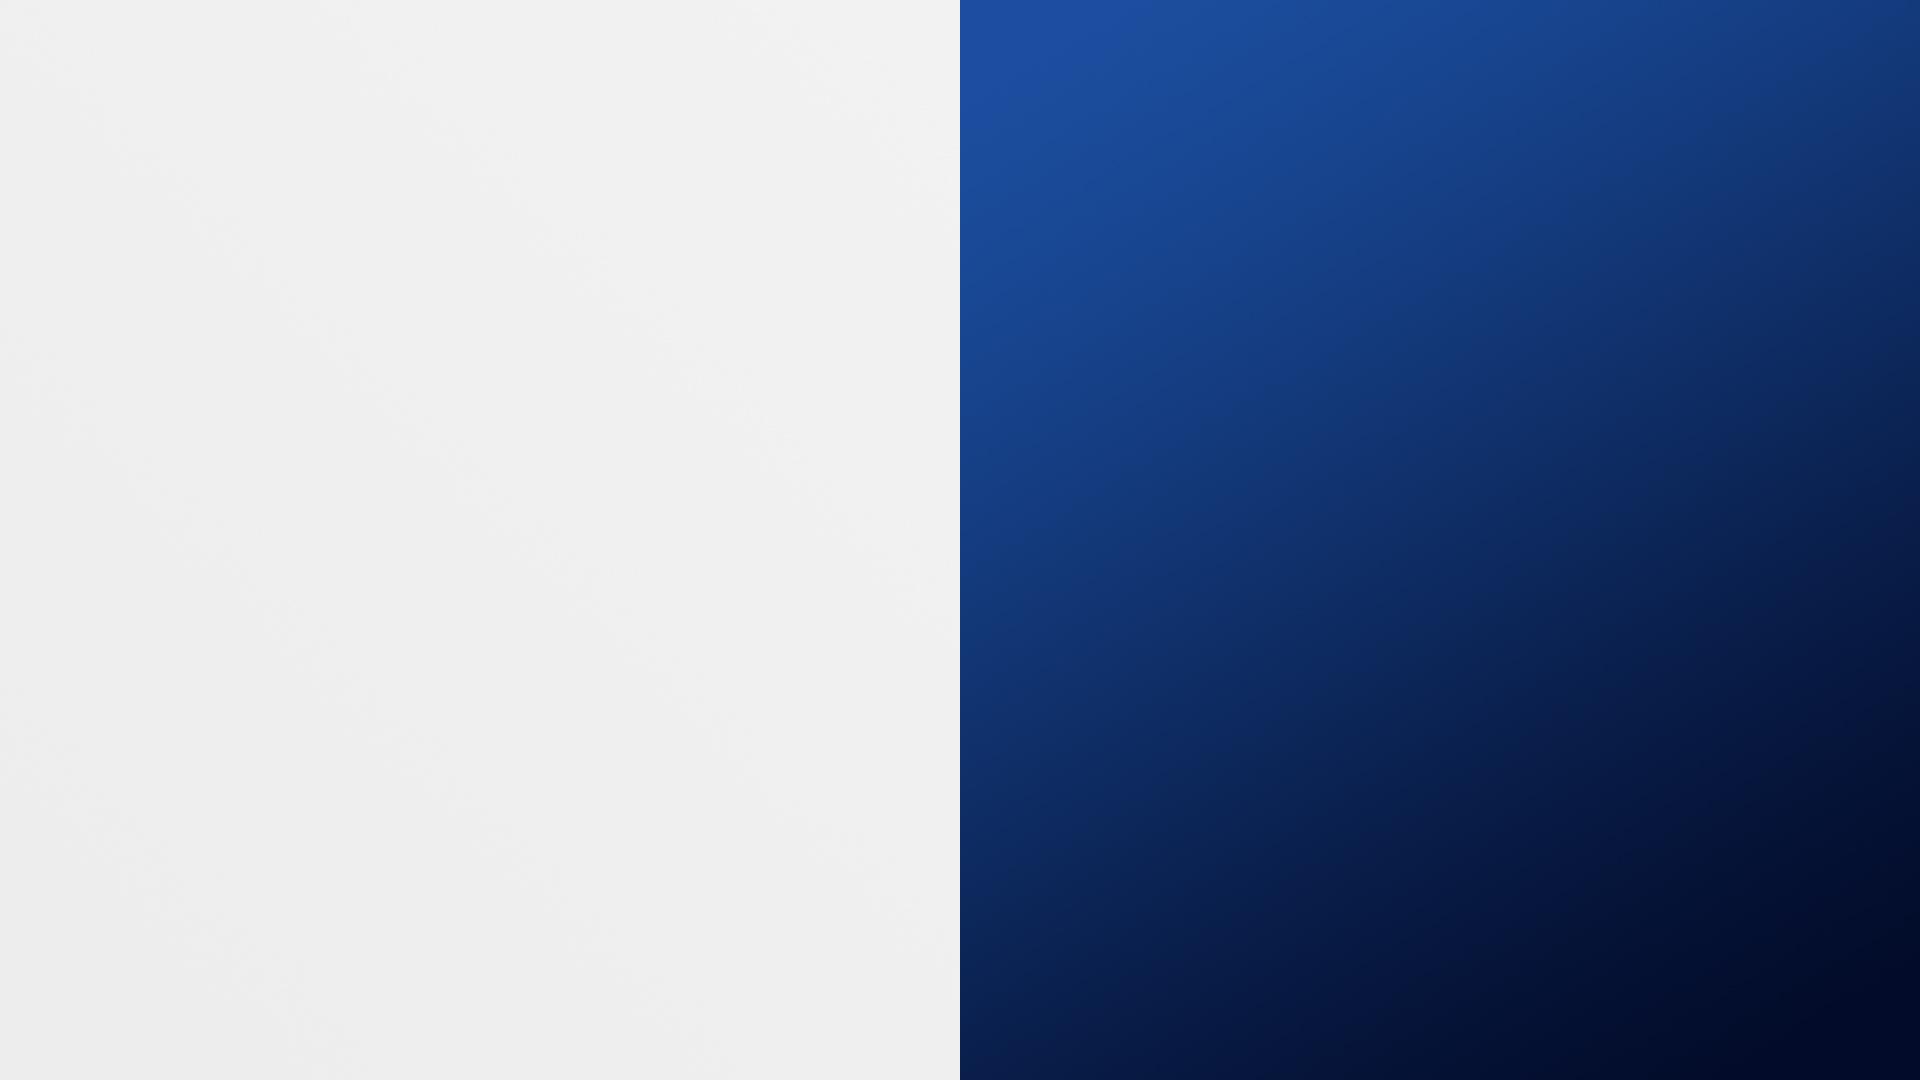 white and dark blue background